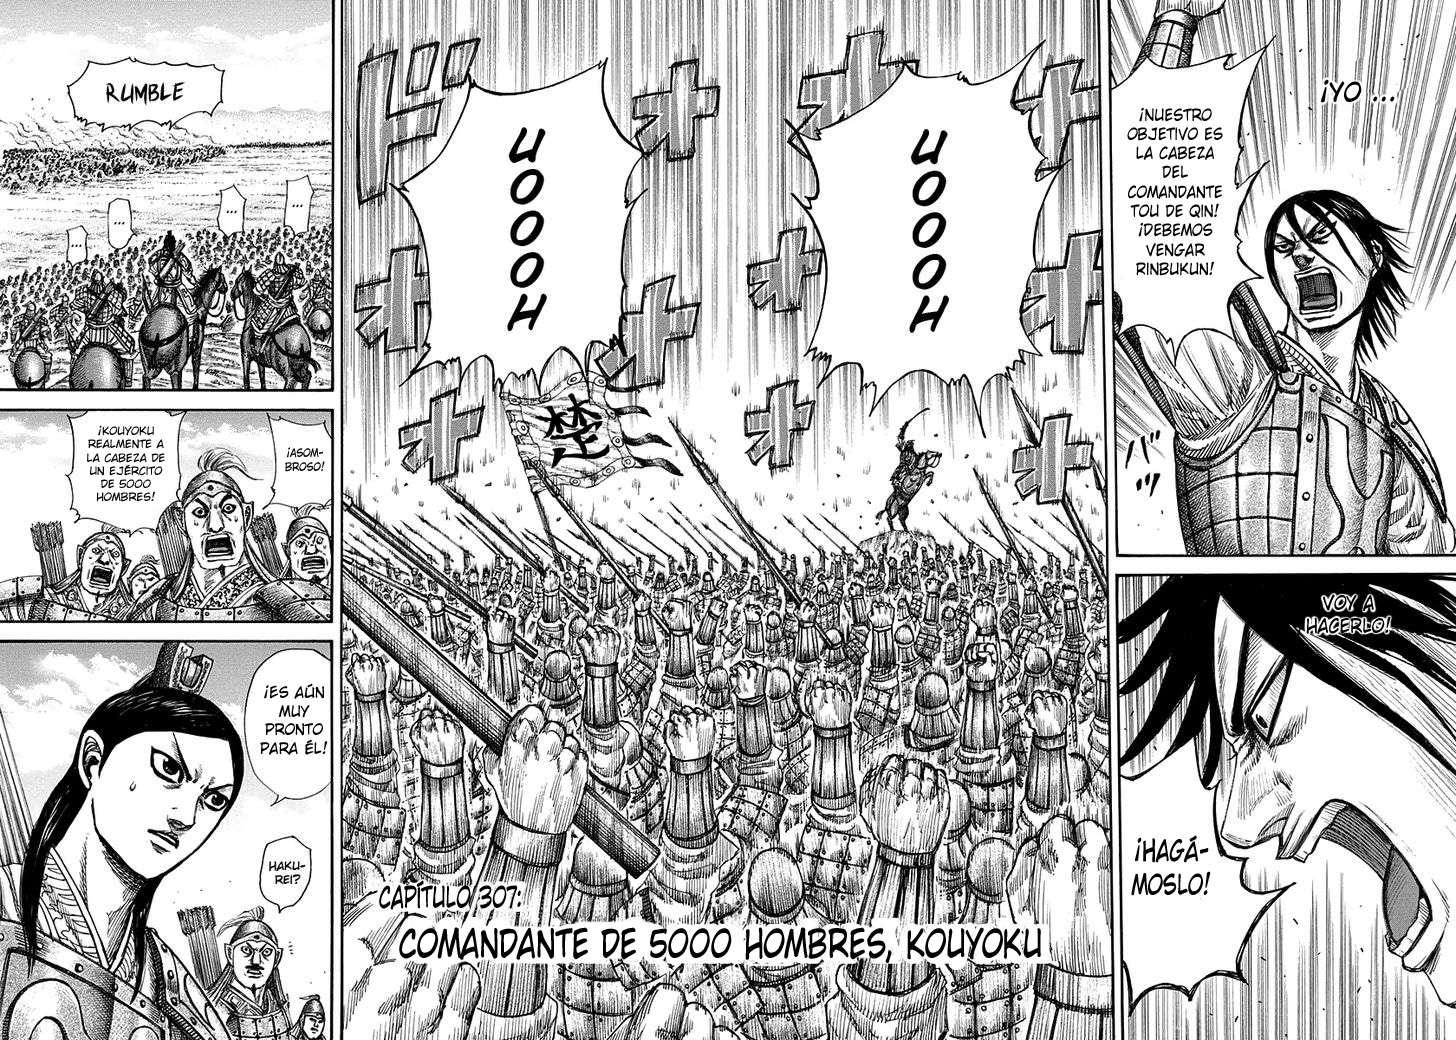 http://c5.ninemanga.com/es_manga/19/12307/360890/9ff016546e872eb88257008651af50ef.jpg Page 3